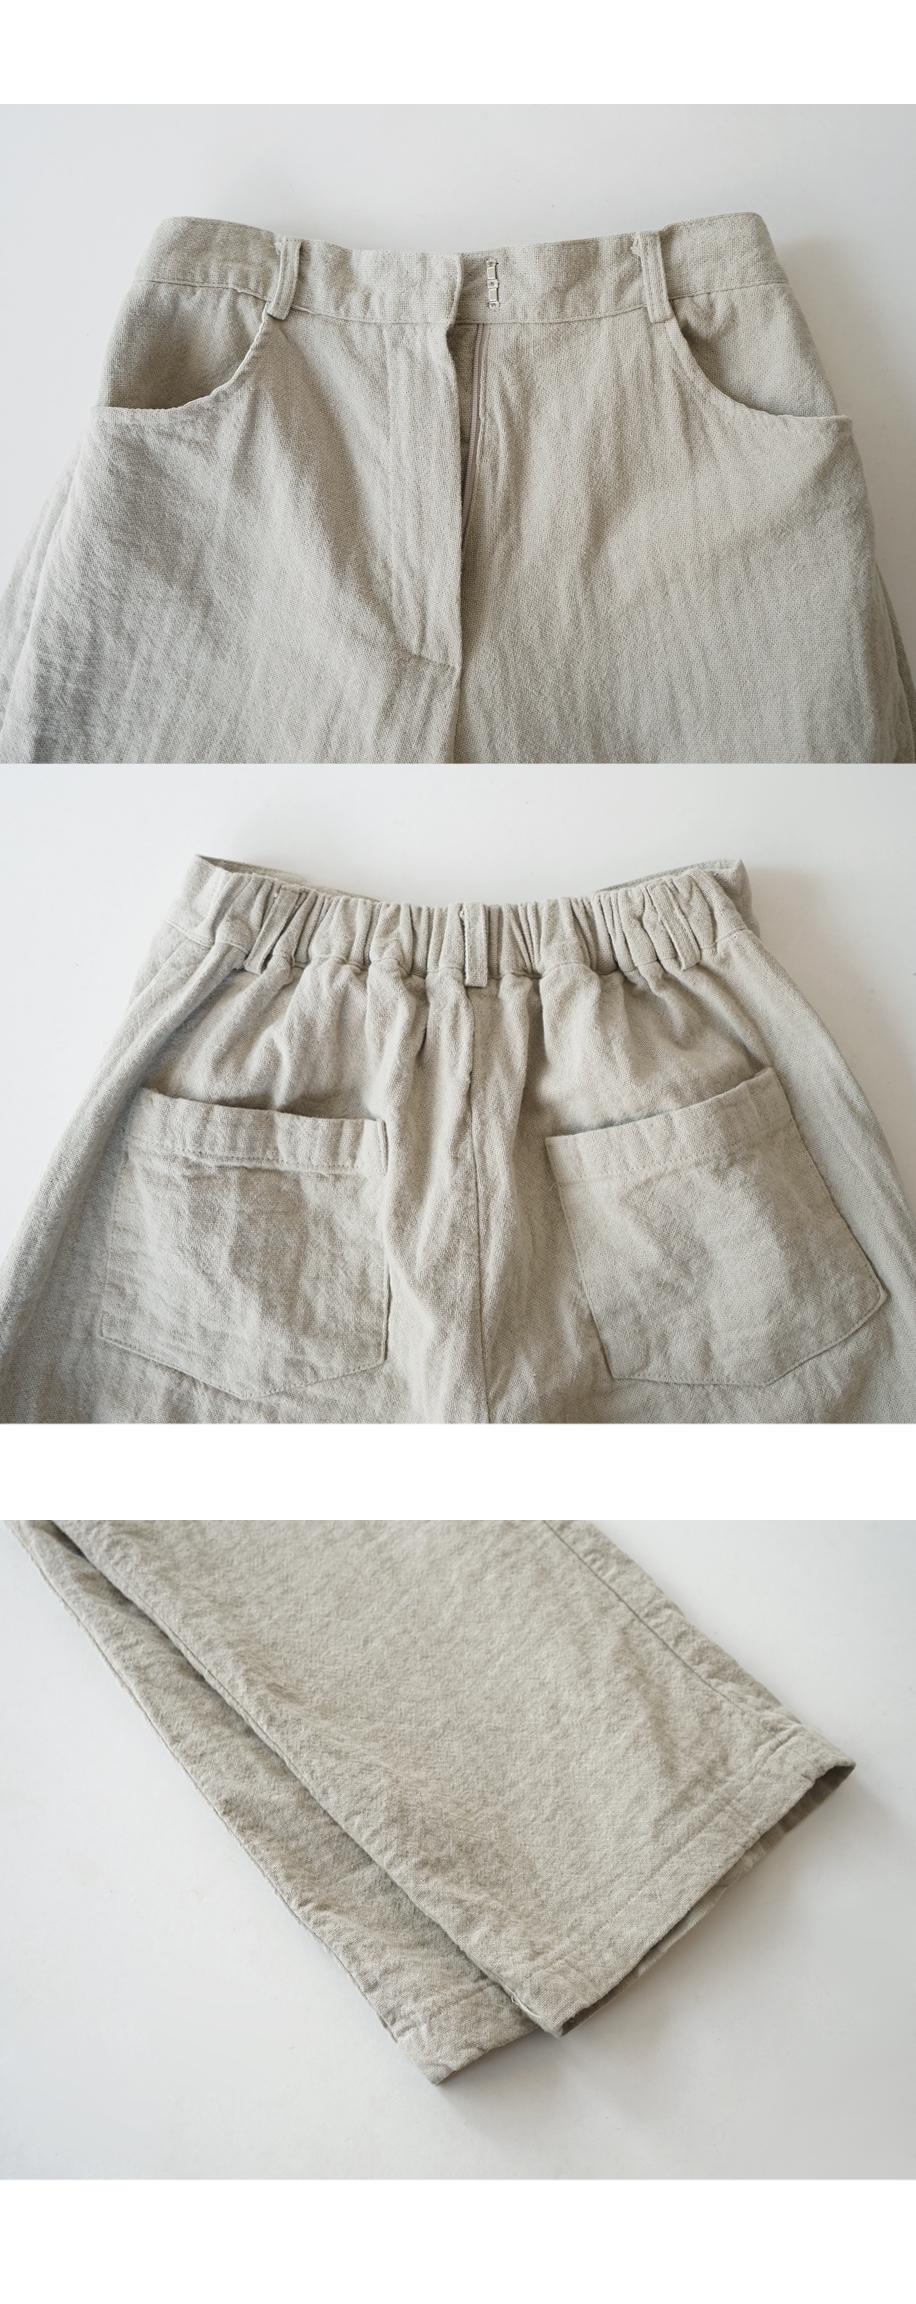 natural linen long slacks